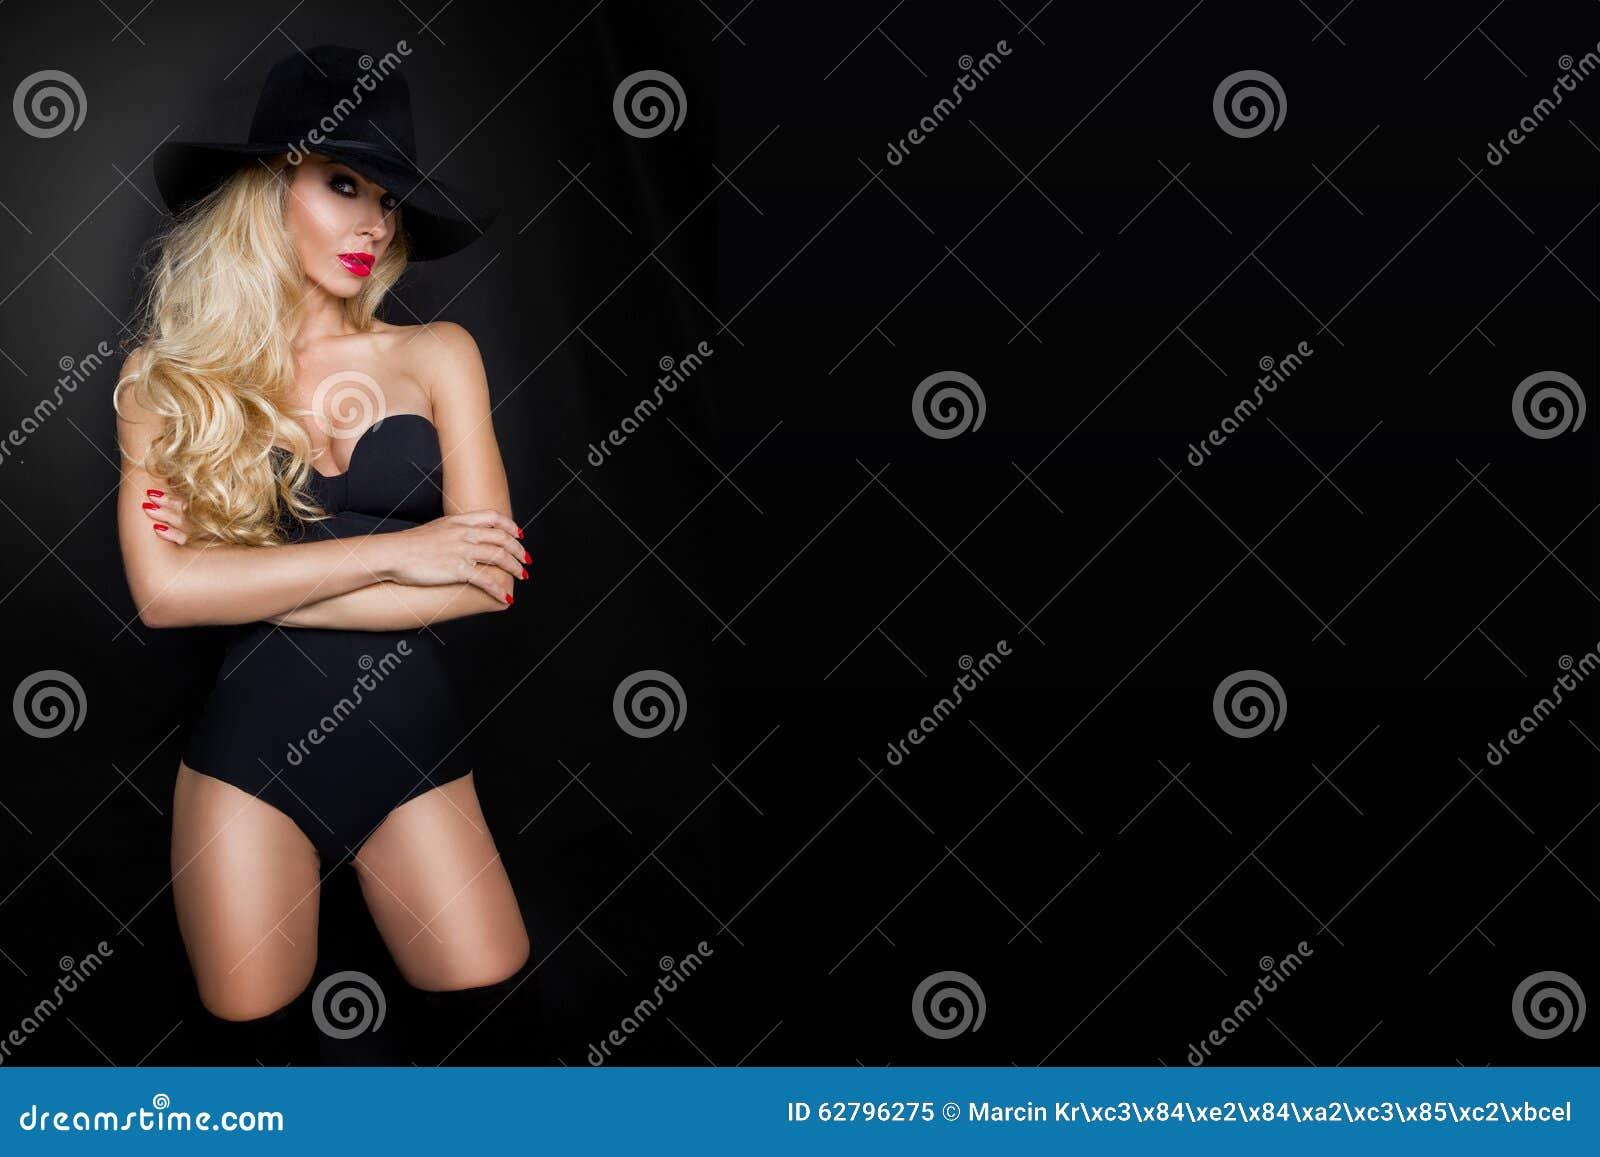 Тело девушки в шляпе